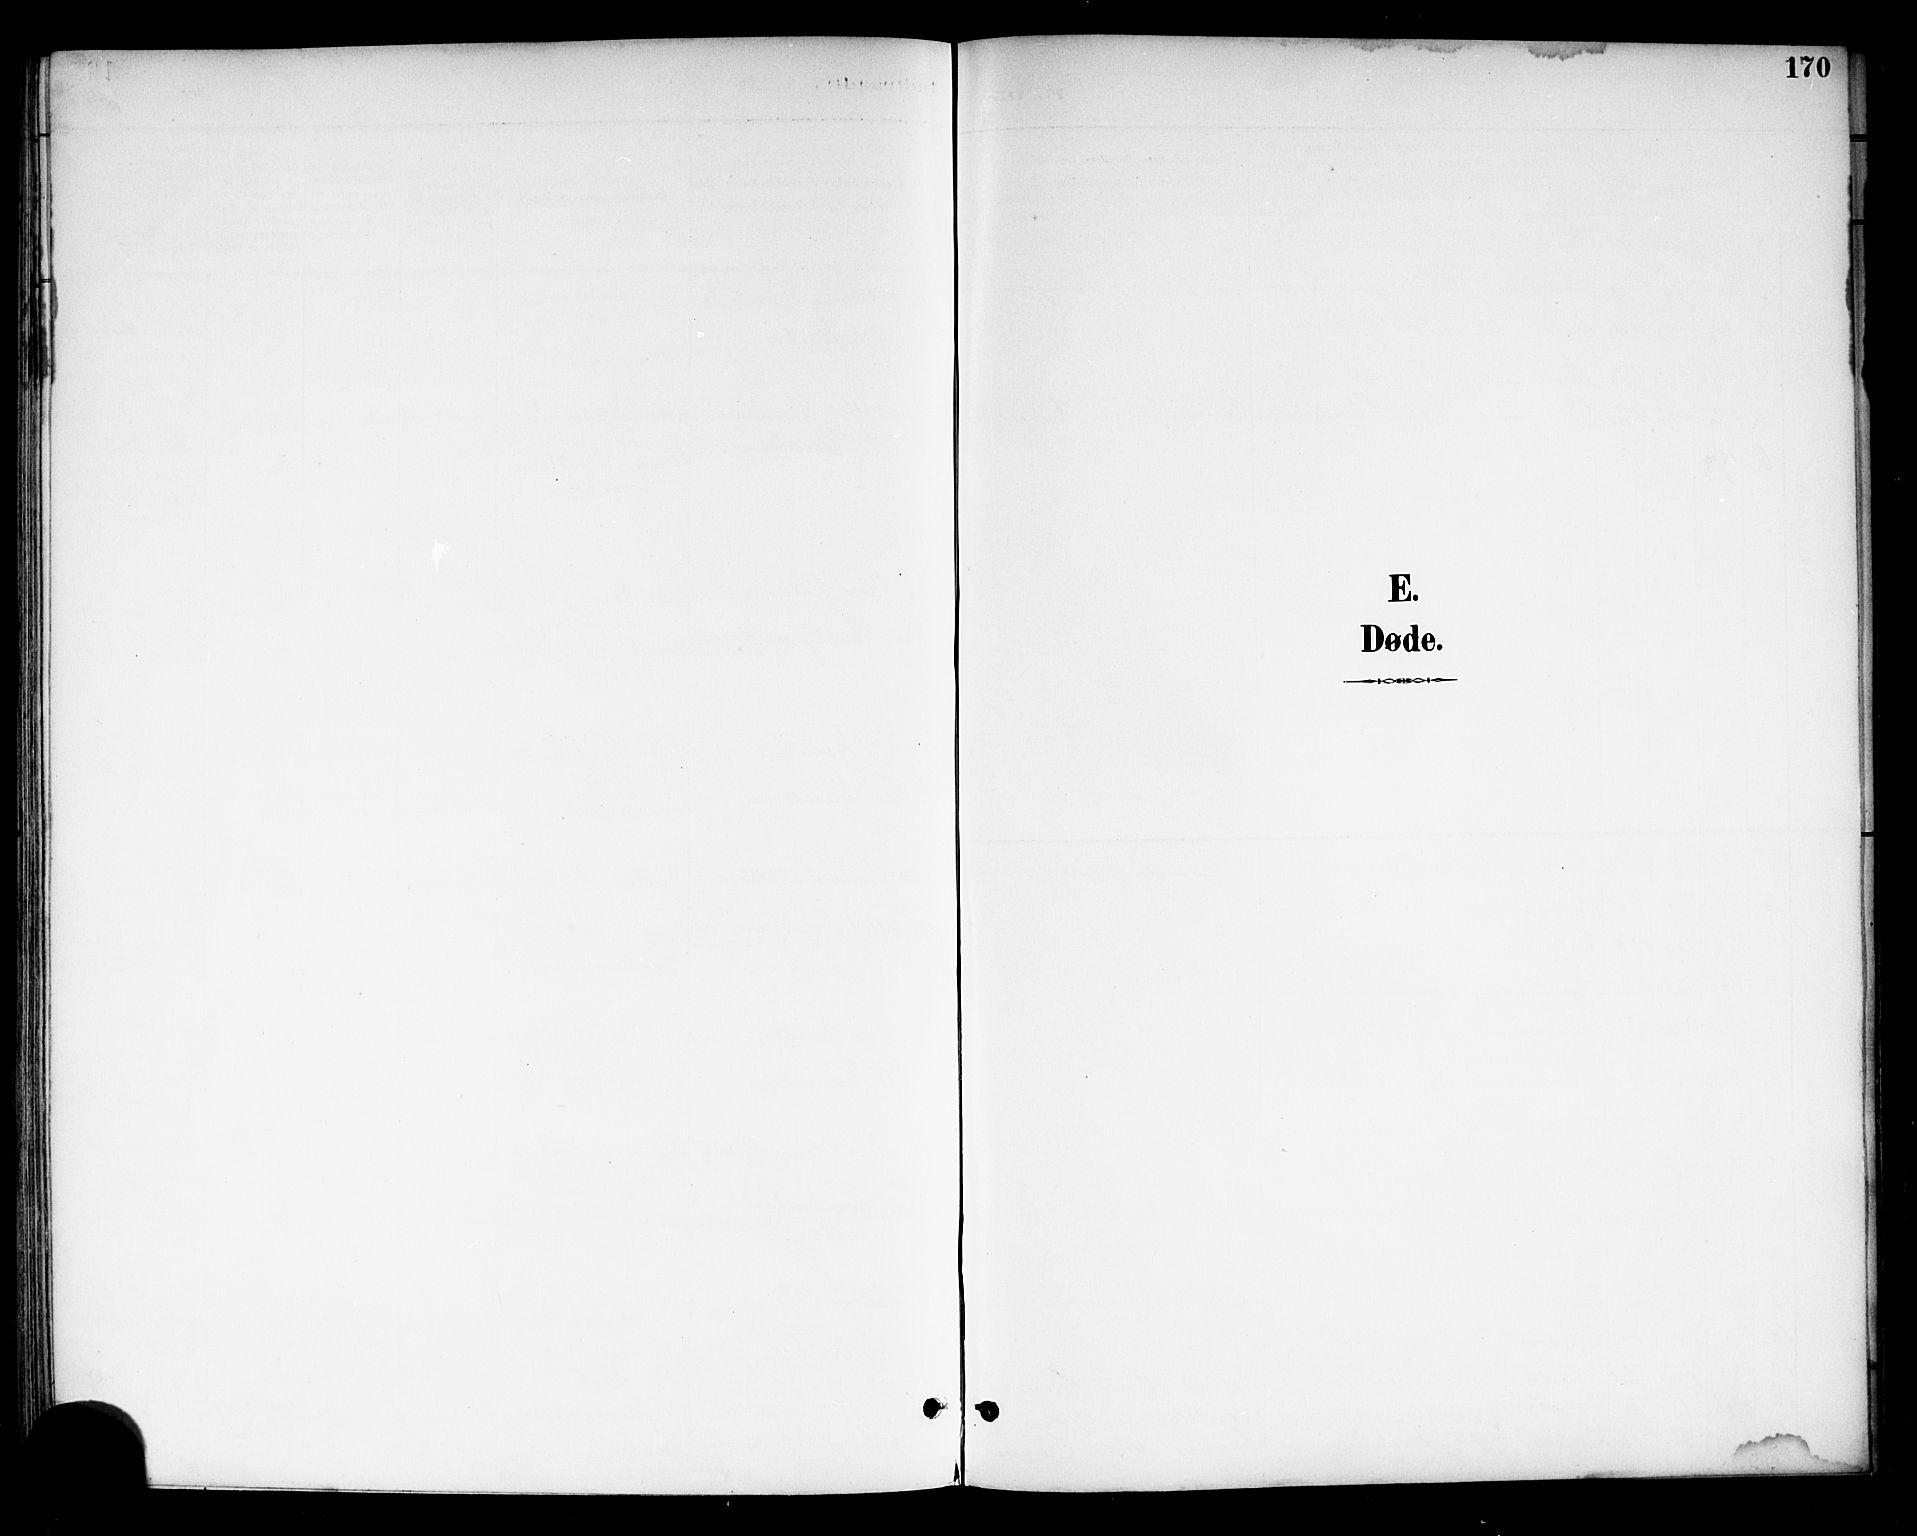 SAKO, Drangedal kirkebøker, G/Gb/L0002: Klokkerbok nr. II 2, 1895-1918, s. 170